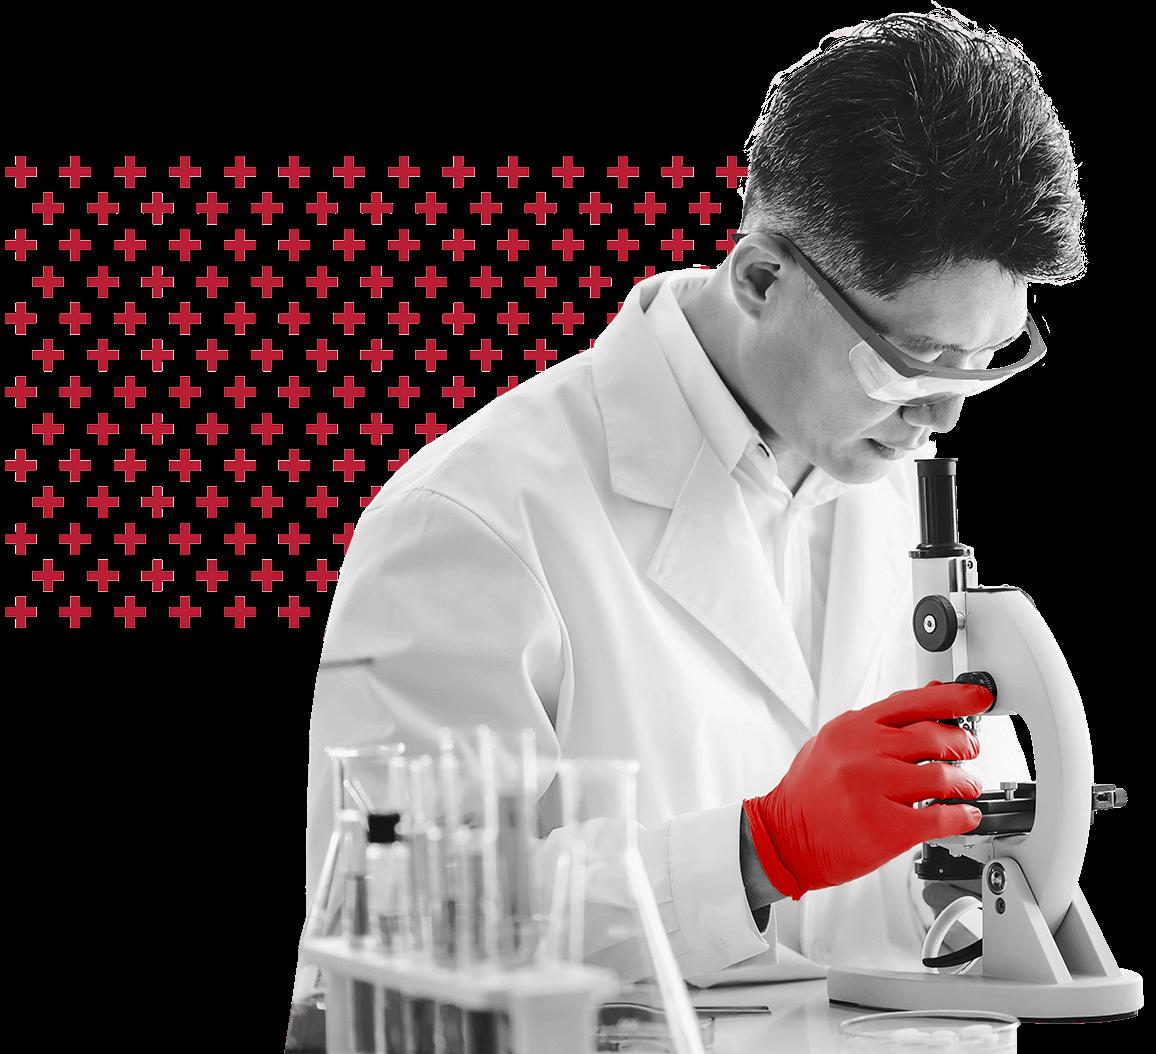 chemistimage